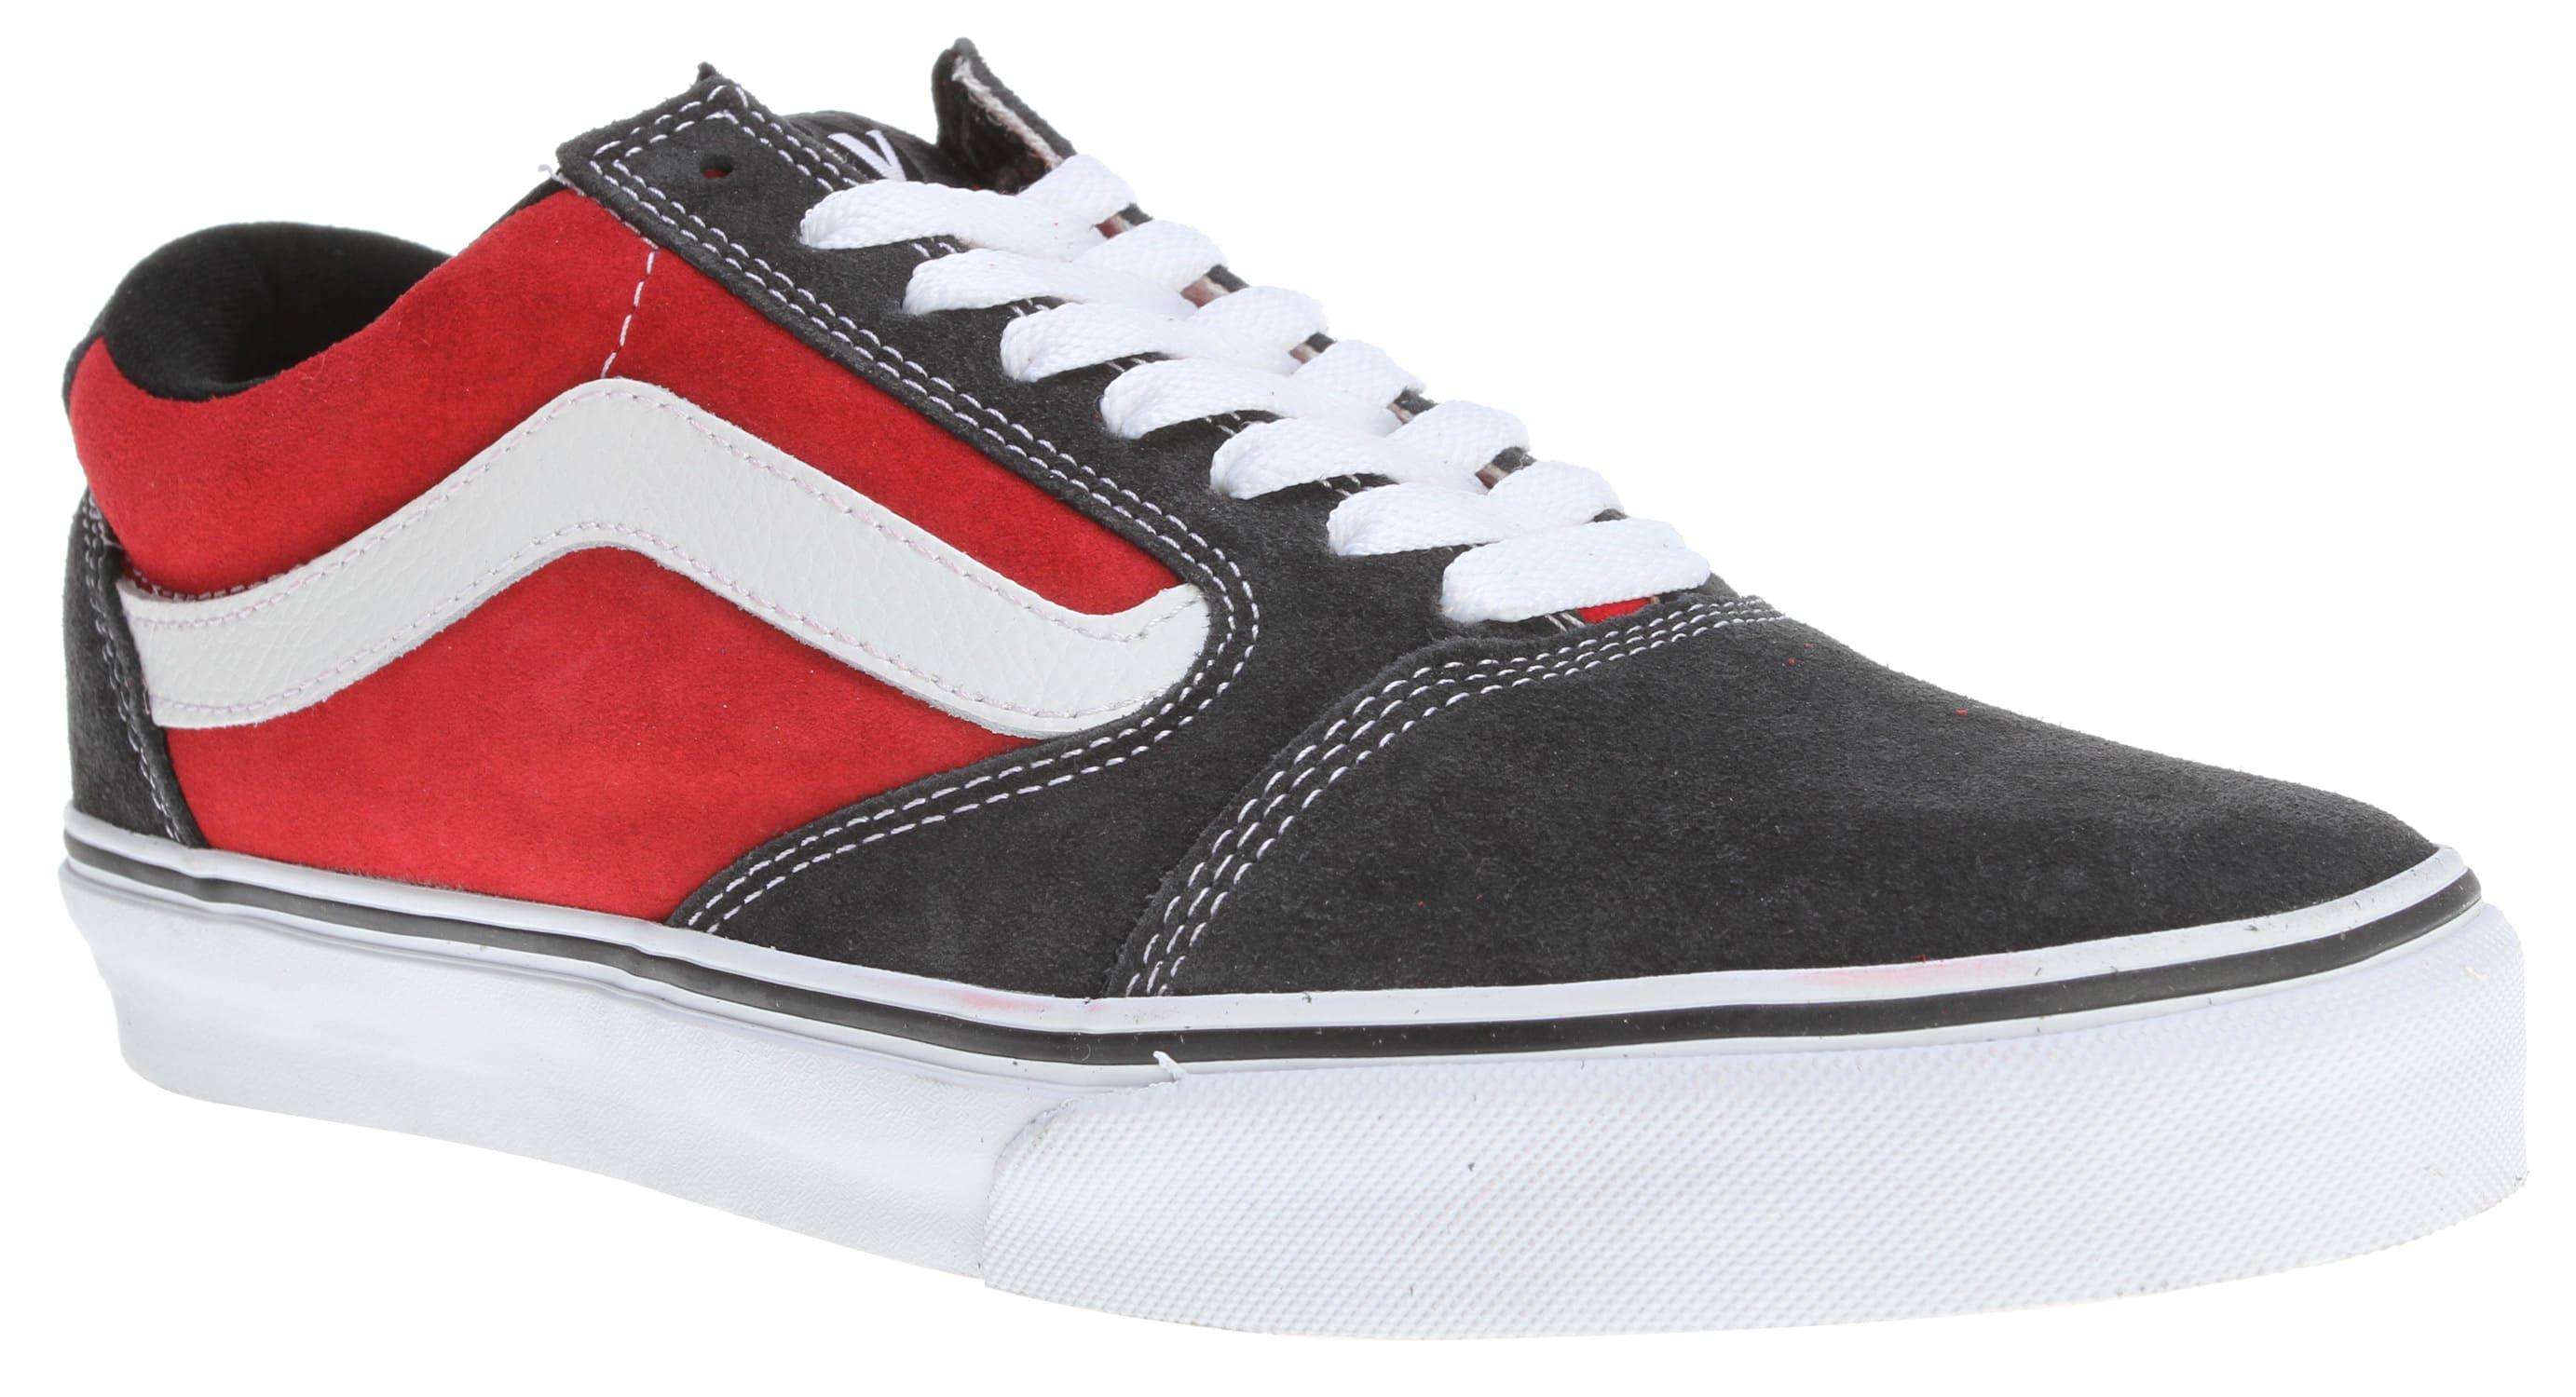 804bf1c19f Vans TNT 5 Skate Shoes - thumbnail 2